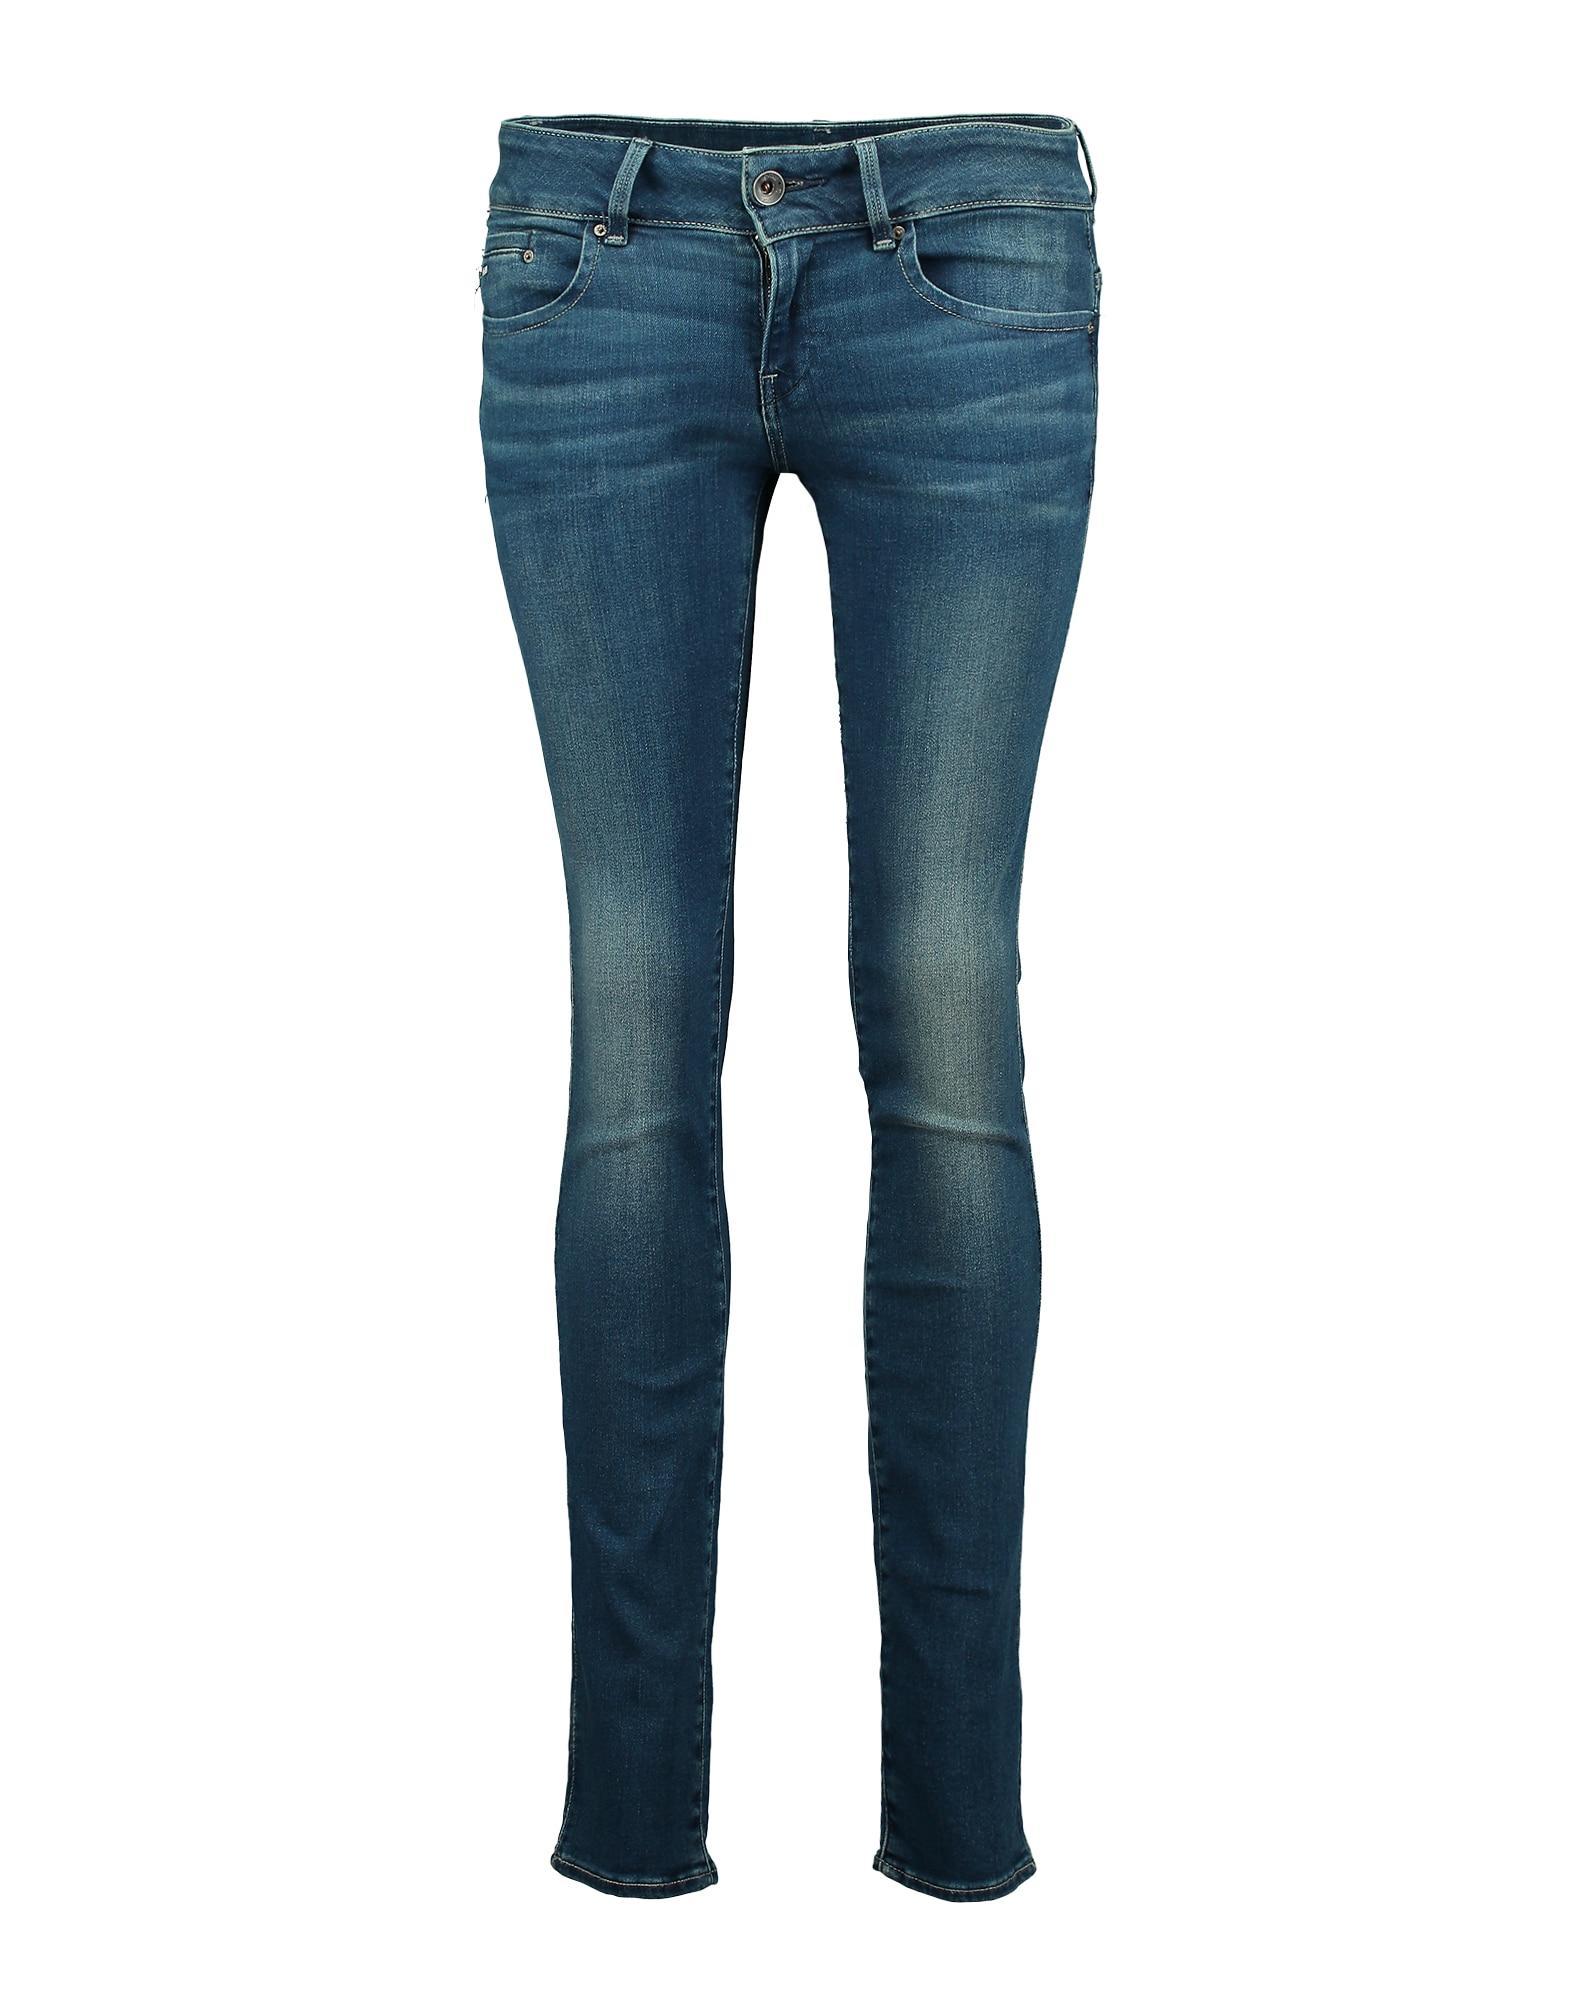 G-STAR RAW Dames Jeans Midge Cody indigo